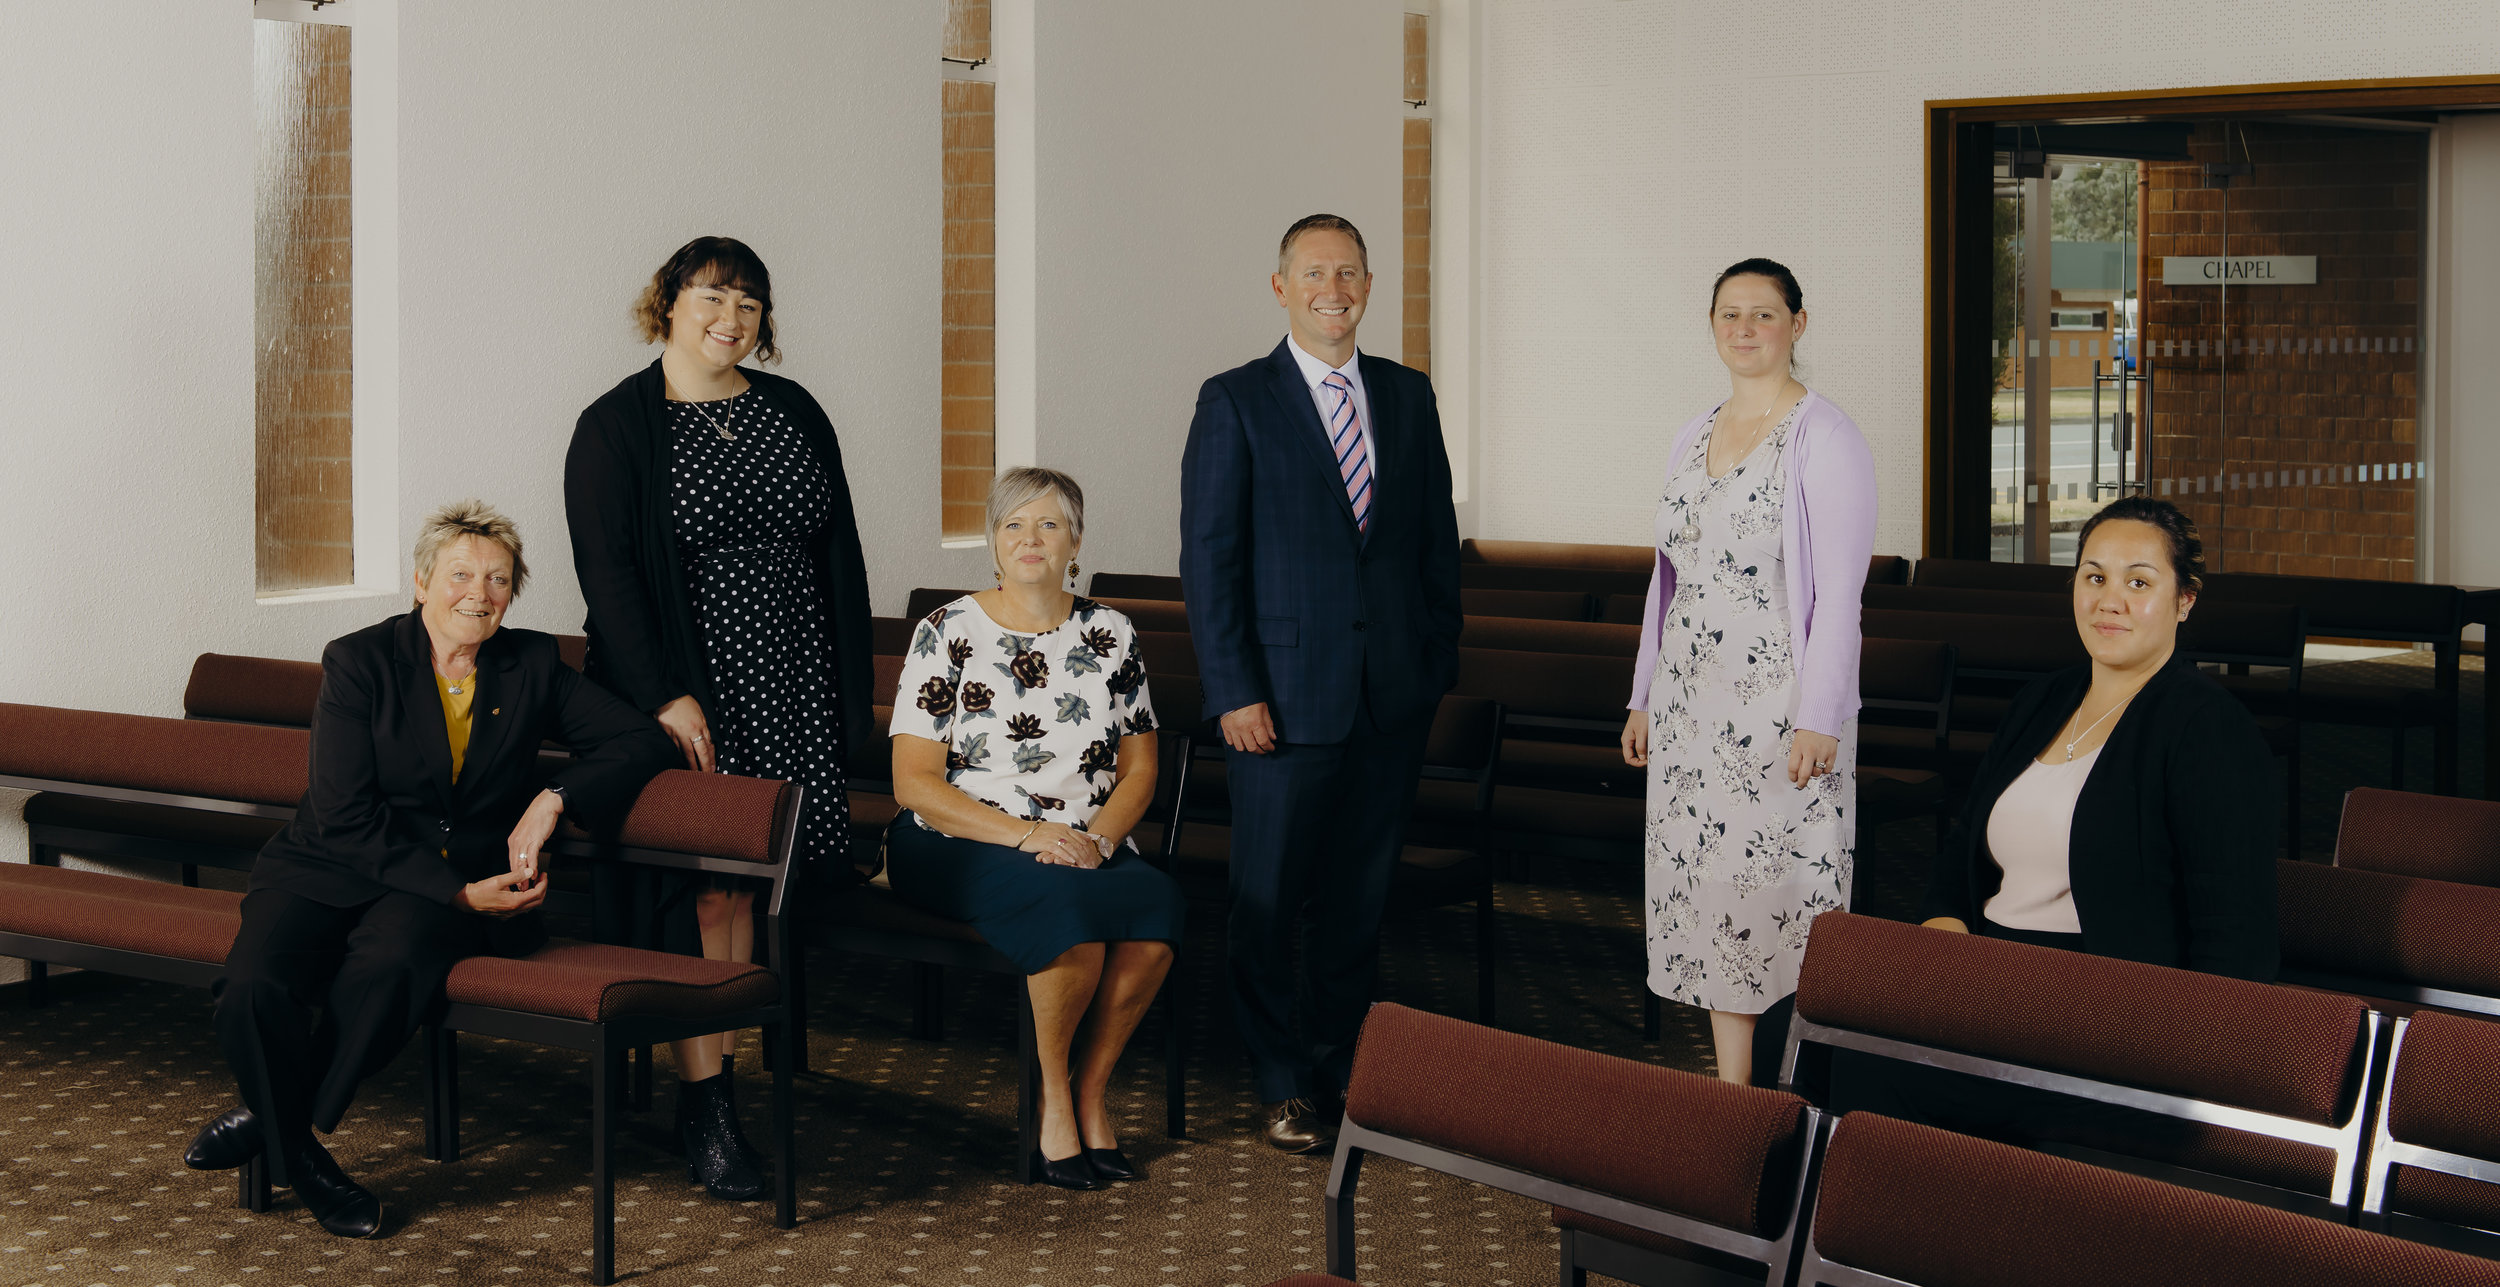 Hope and Sons Management Team (2019)   Robyn Thomson, Jodie Hope, Johanna Kinvig, Andrew Maffey, Melanie Pearson, Megan Te Amo.